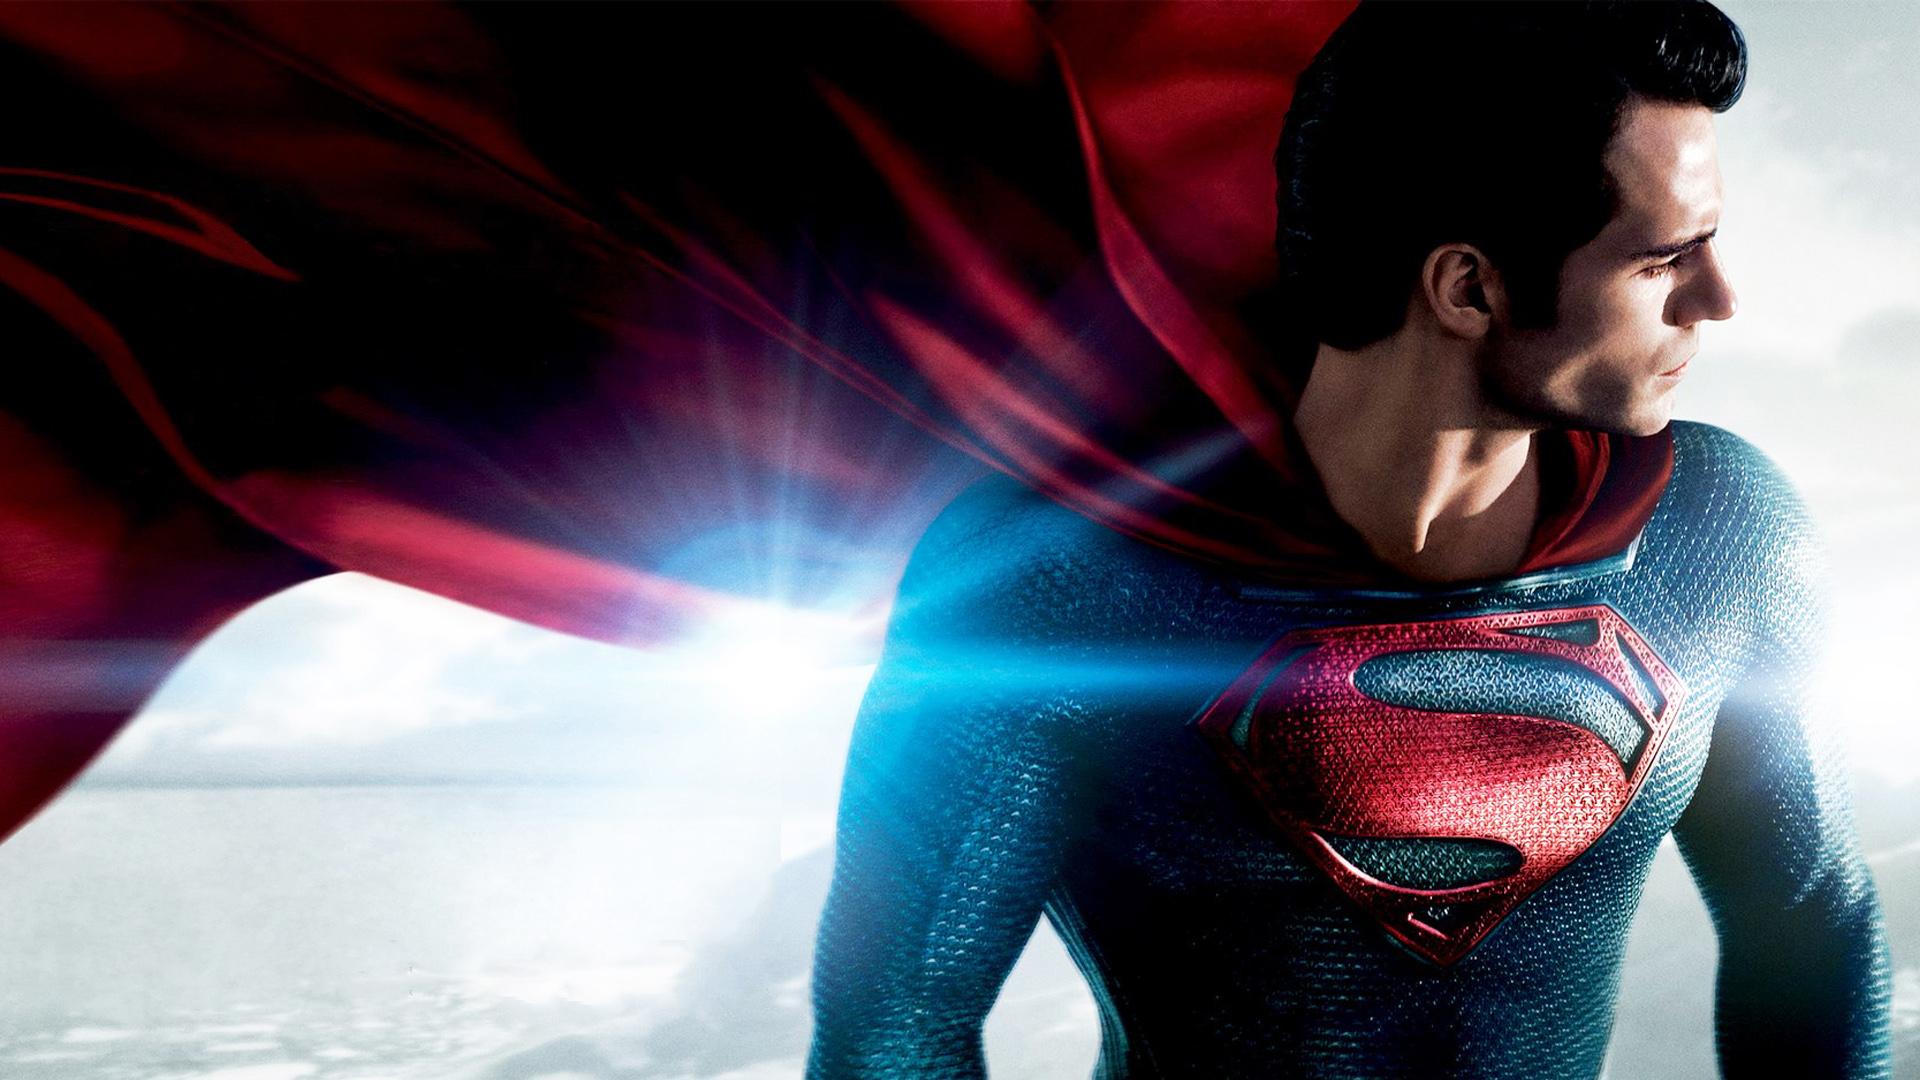 Best 35 Superman HD Wallpaper for Desktop 1920x1080